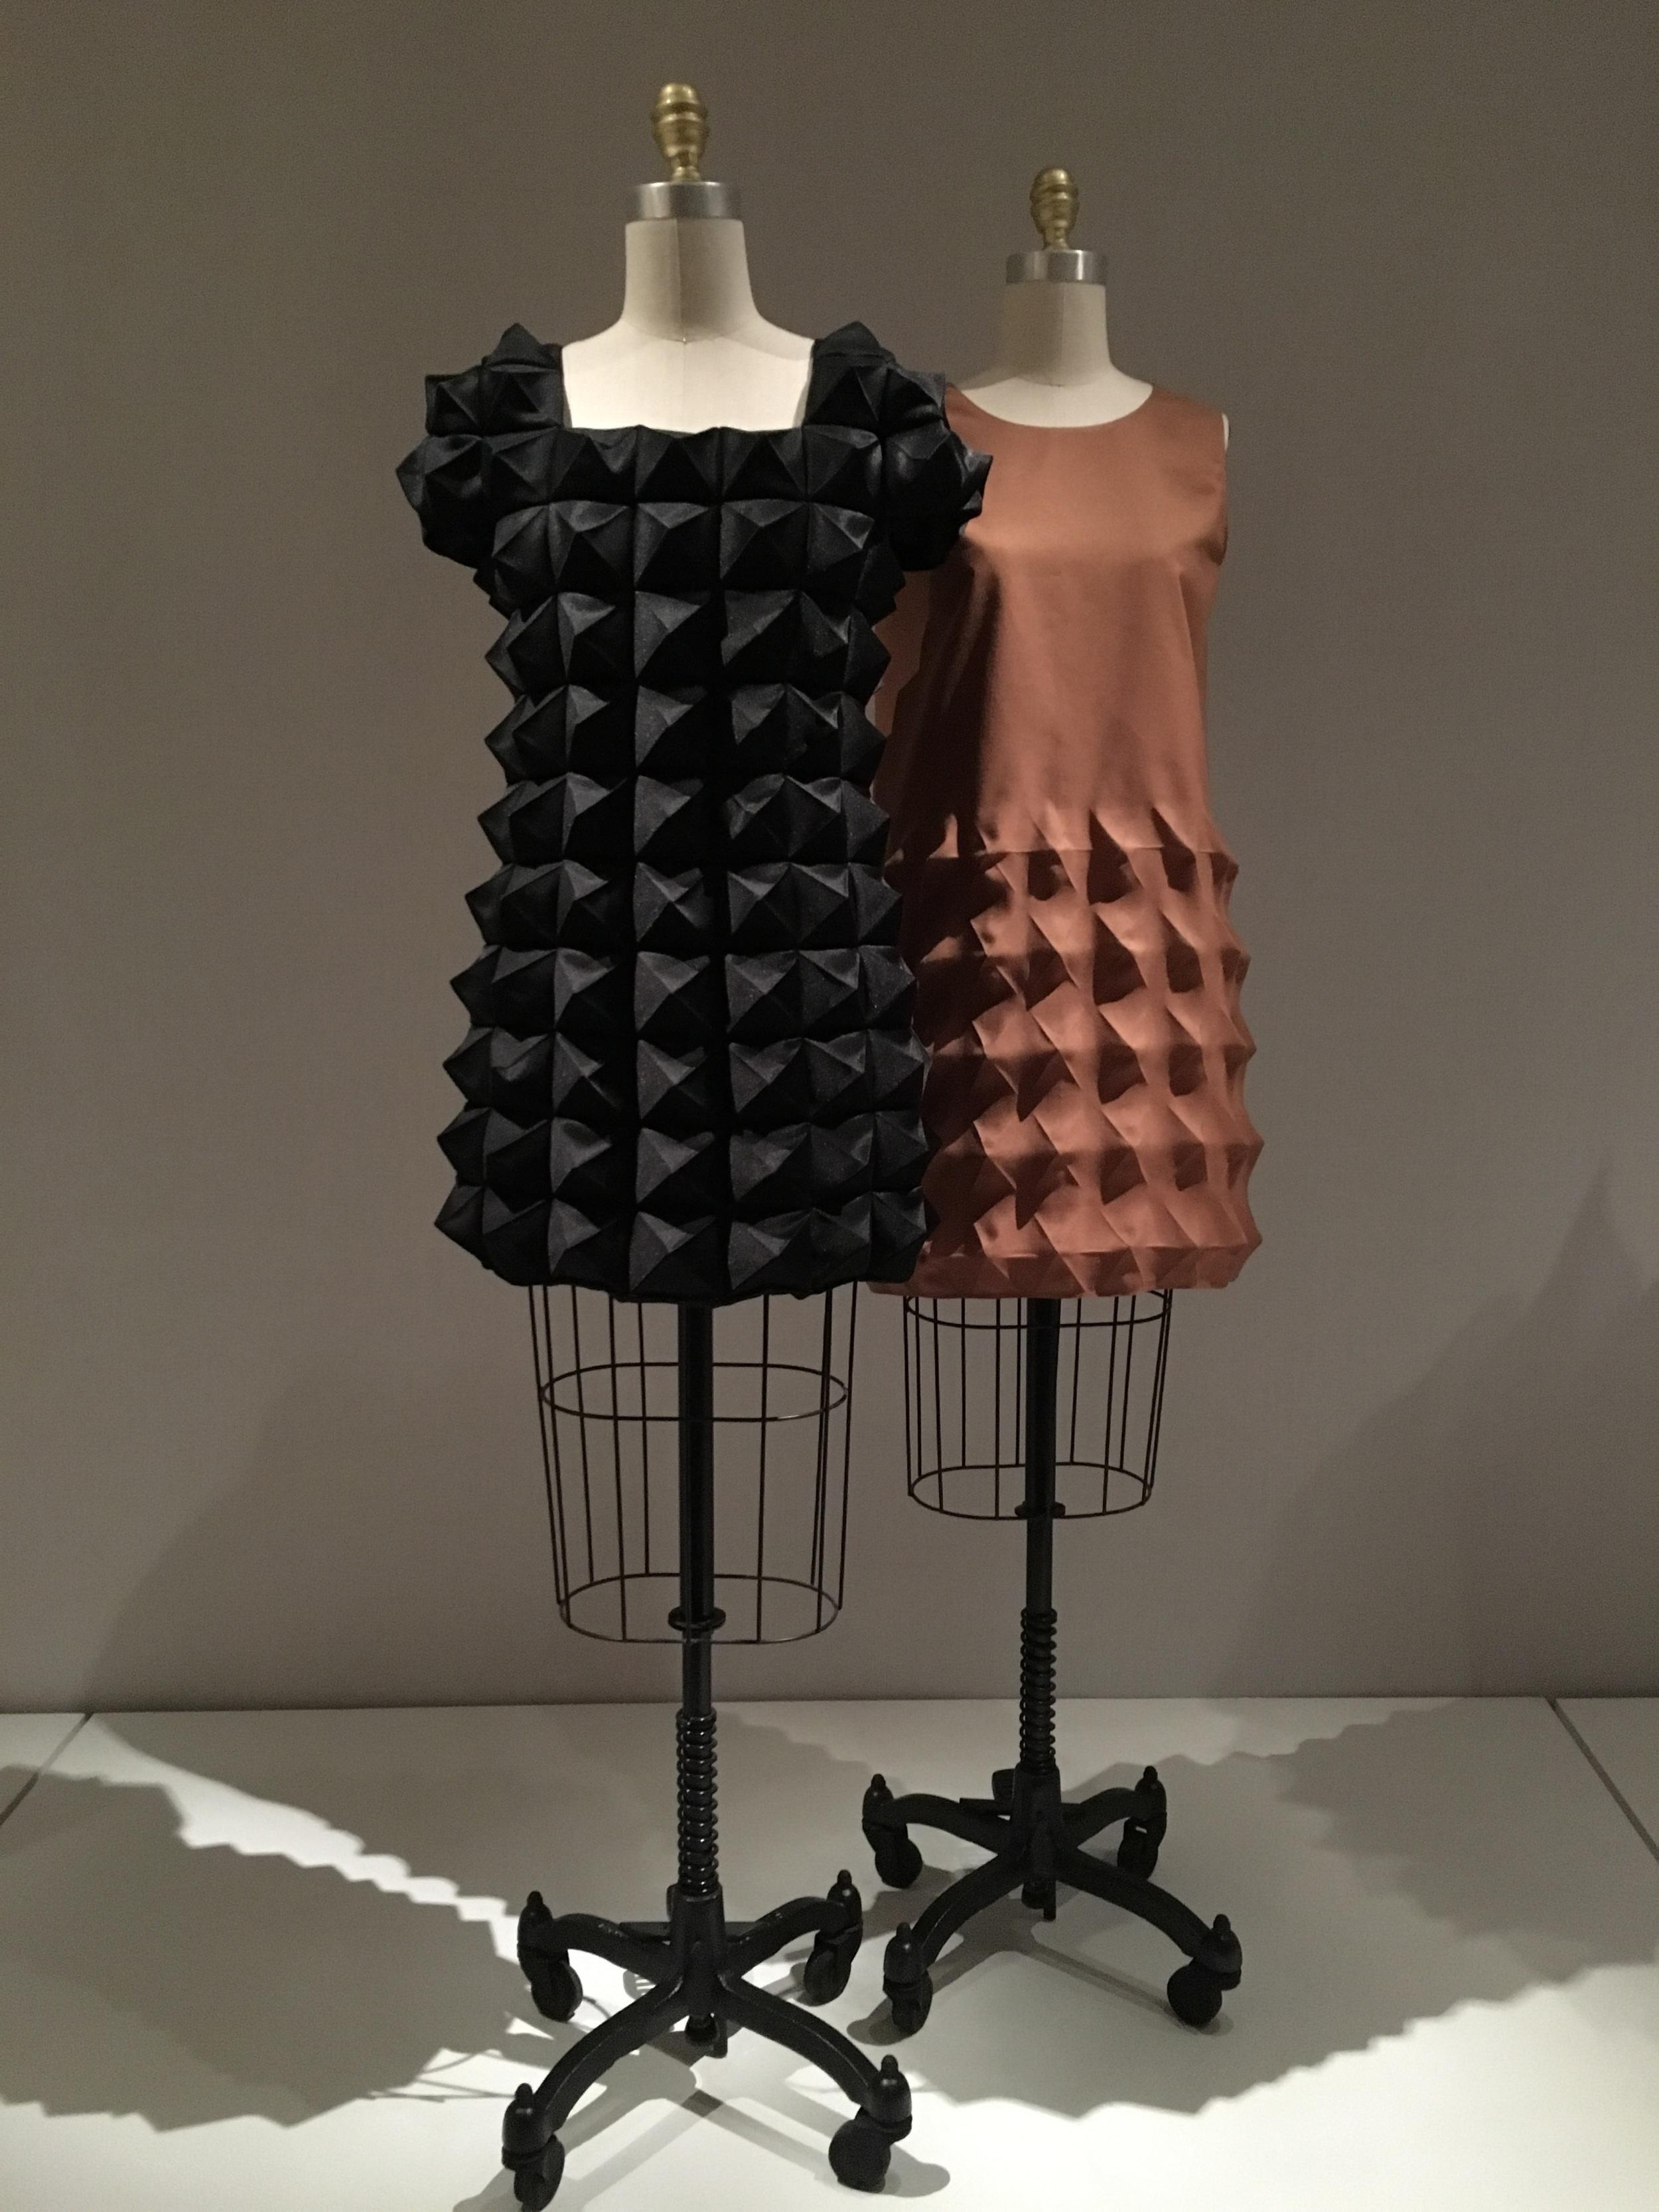 Comme des Garçons  Junya Watanabe  AW 2015/2016, prêt-à-porter  Machine sewn, heat-molded black polyester satin    Pierre Cardin  1968, haute couture  Machine sewn, heat-molded brown polyester Cardine (Dynel)